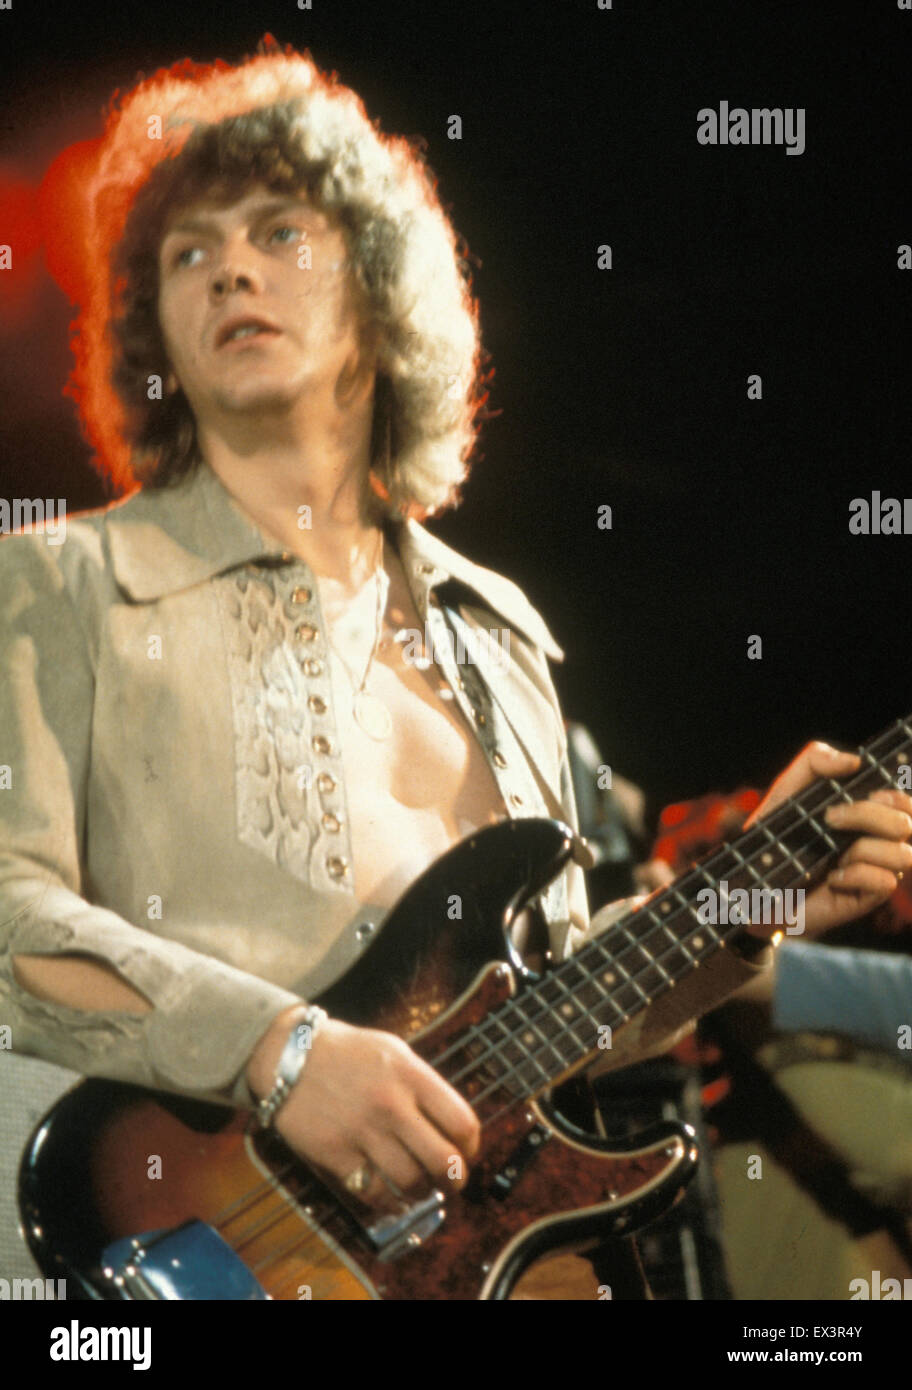 Moody Blues Uk Rock Group With John Lodge About 1975 Stock Photo Alamy